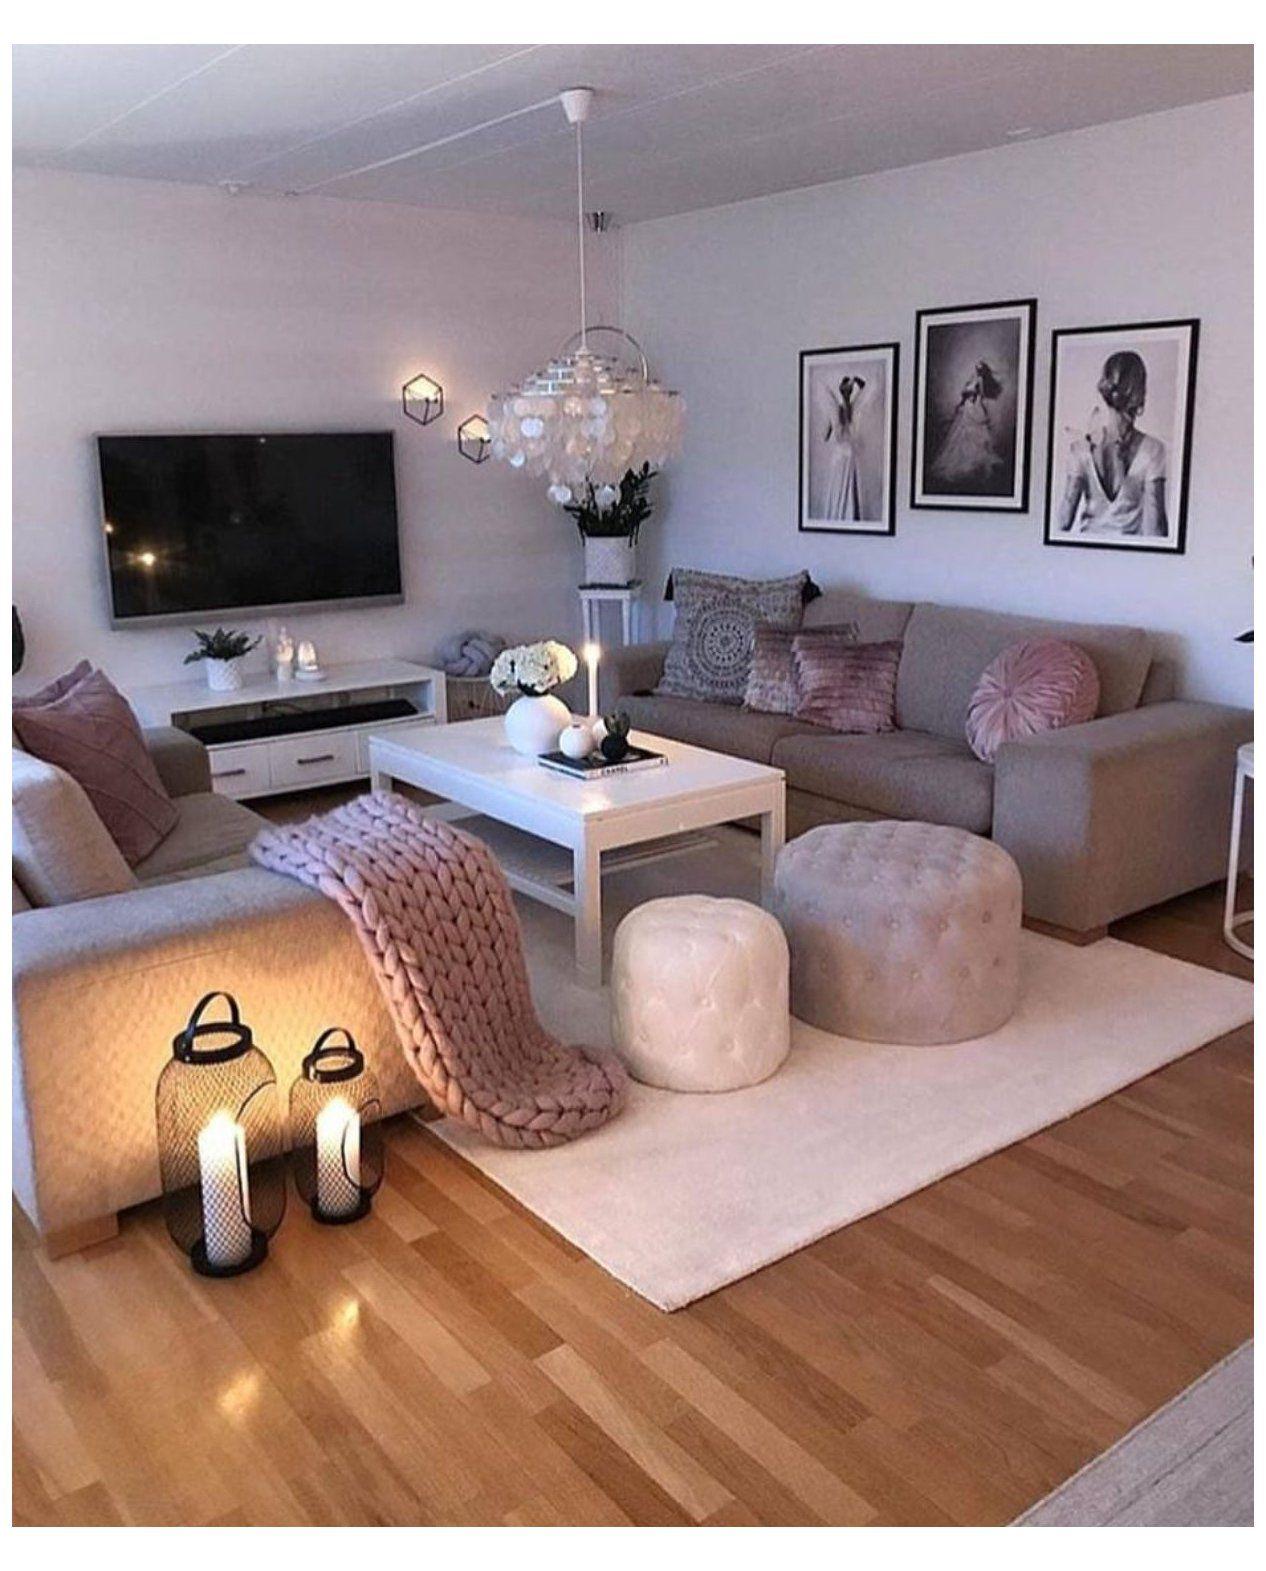 Warm Cosy Living Room Warmcosylivingroom Affirmations Living Room Decor Apartment Small Apartment Living Room Apartment Living Room Warm living room decor